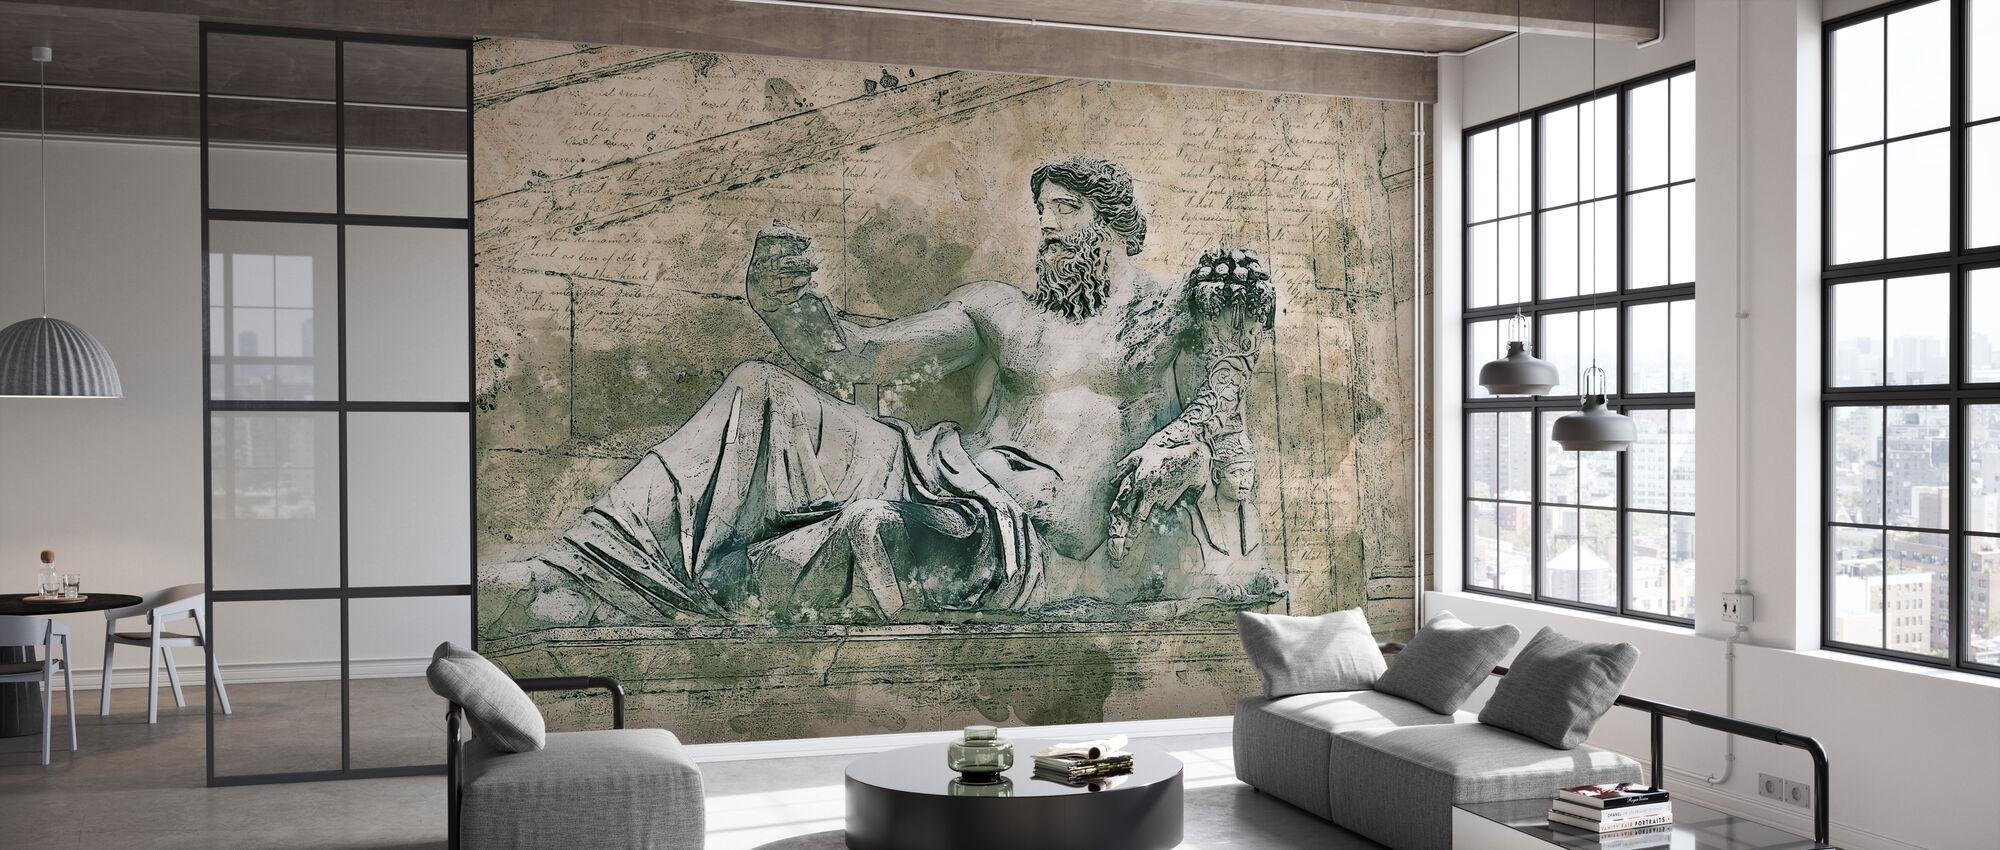 Rom Vintage Statue - Tapete - Büro